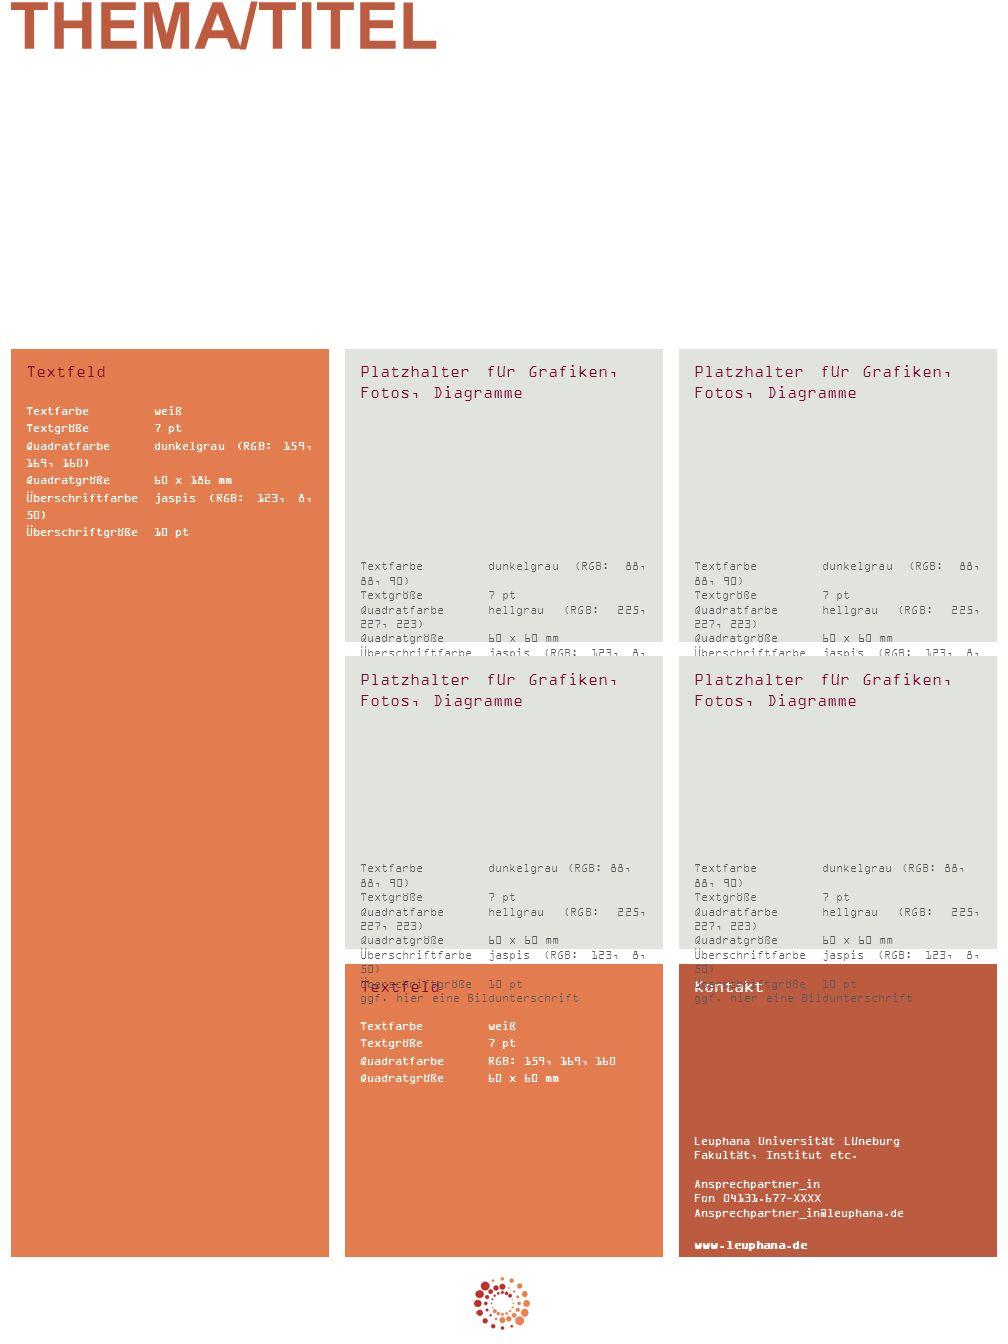 Textfeld Textfarbeweiß Textgröße 7 pt Quadratfarbedunkelgrau (RGB: 159, 169, 160) Quadratgröße60 x 186 mm Überschriftfarbejaspis (RGB: 123, 8, 50) Überschriftgröße10 pt Platzhalter für Grafiken, Fotos, Diagramme Textfarbedunkelgrau (RGB: 88, 88, 90) Textgröße 7 pt Quadratfarbehellgrau (RGB: 225, 227, 223) Quadratgröße60 x 60 mm Überschriftfarbejaspis (RGB: 123, 8, 50) Überschriftgröße10 pt ggf.